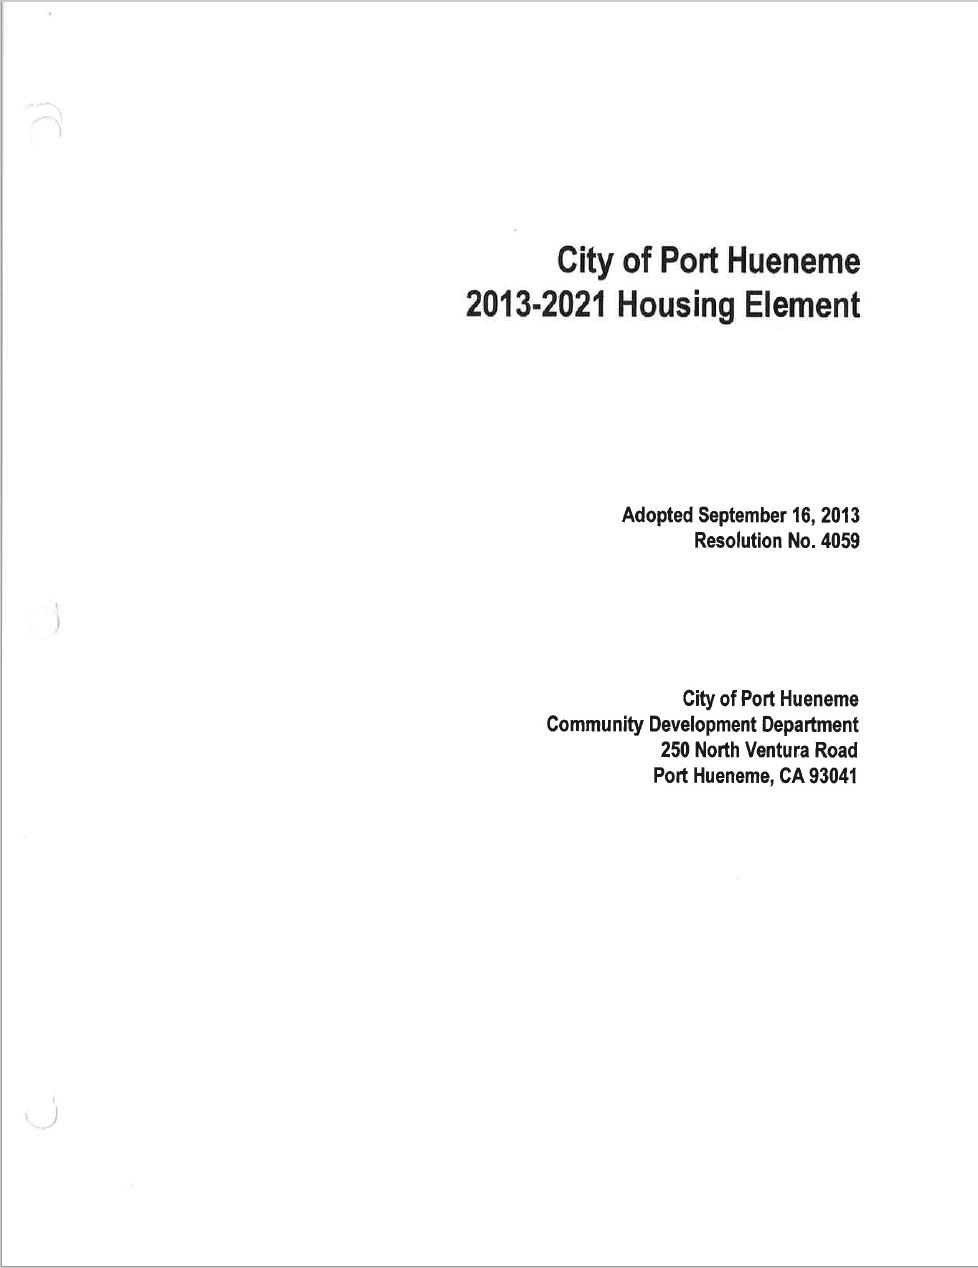 Housing Element.png